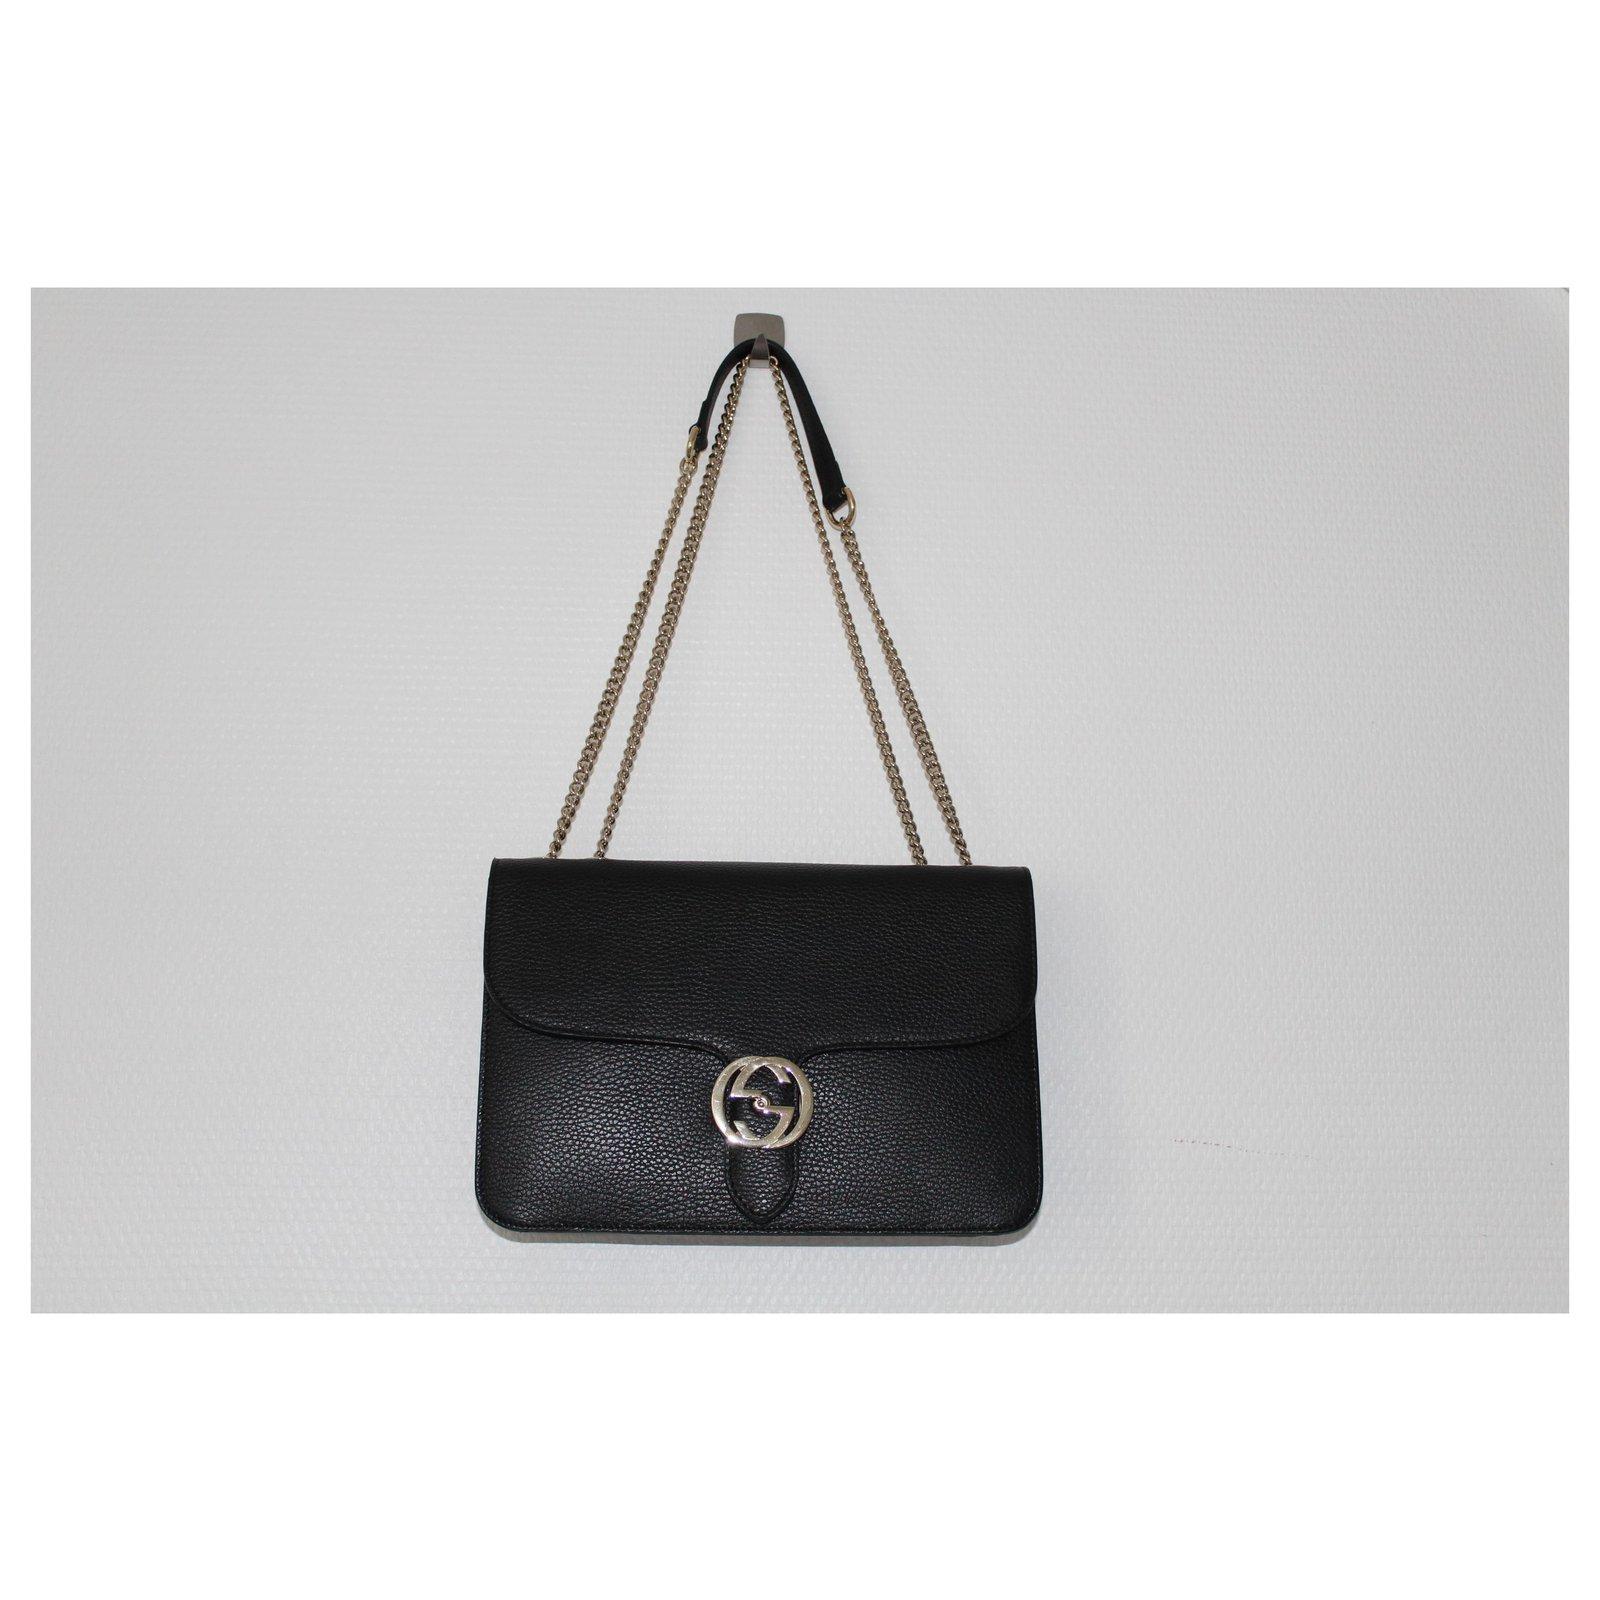 93831668eaaa Gucci interlocking Handbags Lambskin Black ref.124973 - Joli Closet